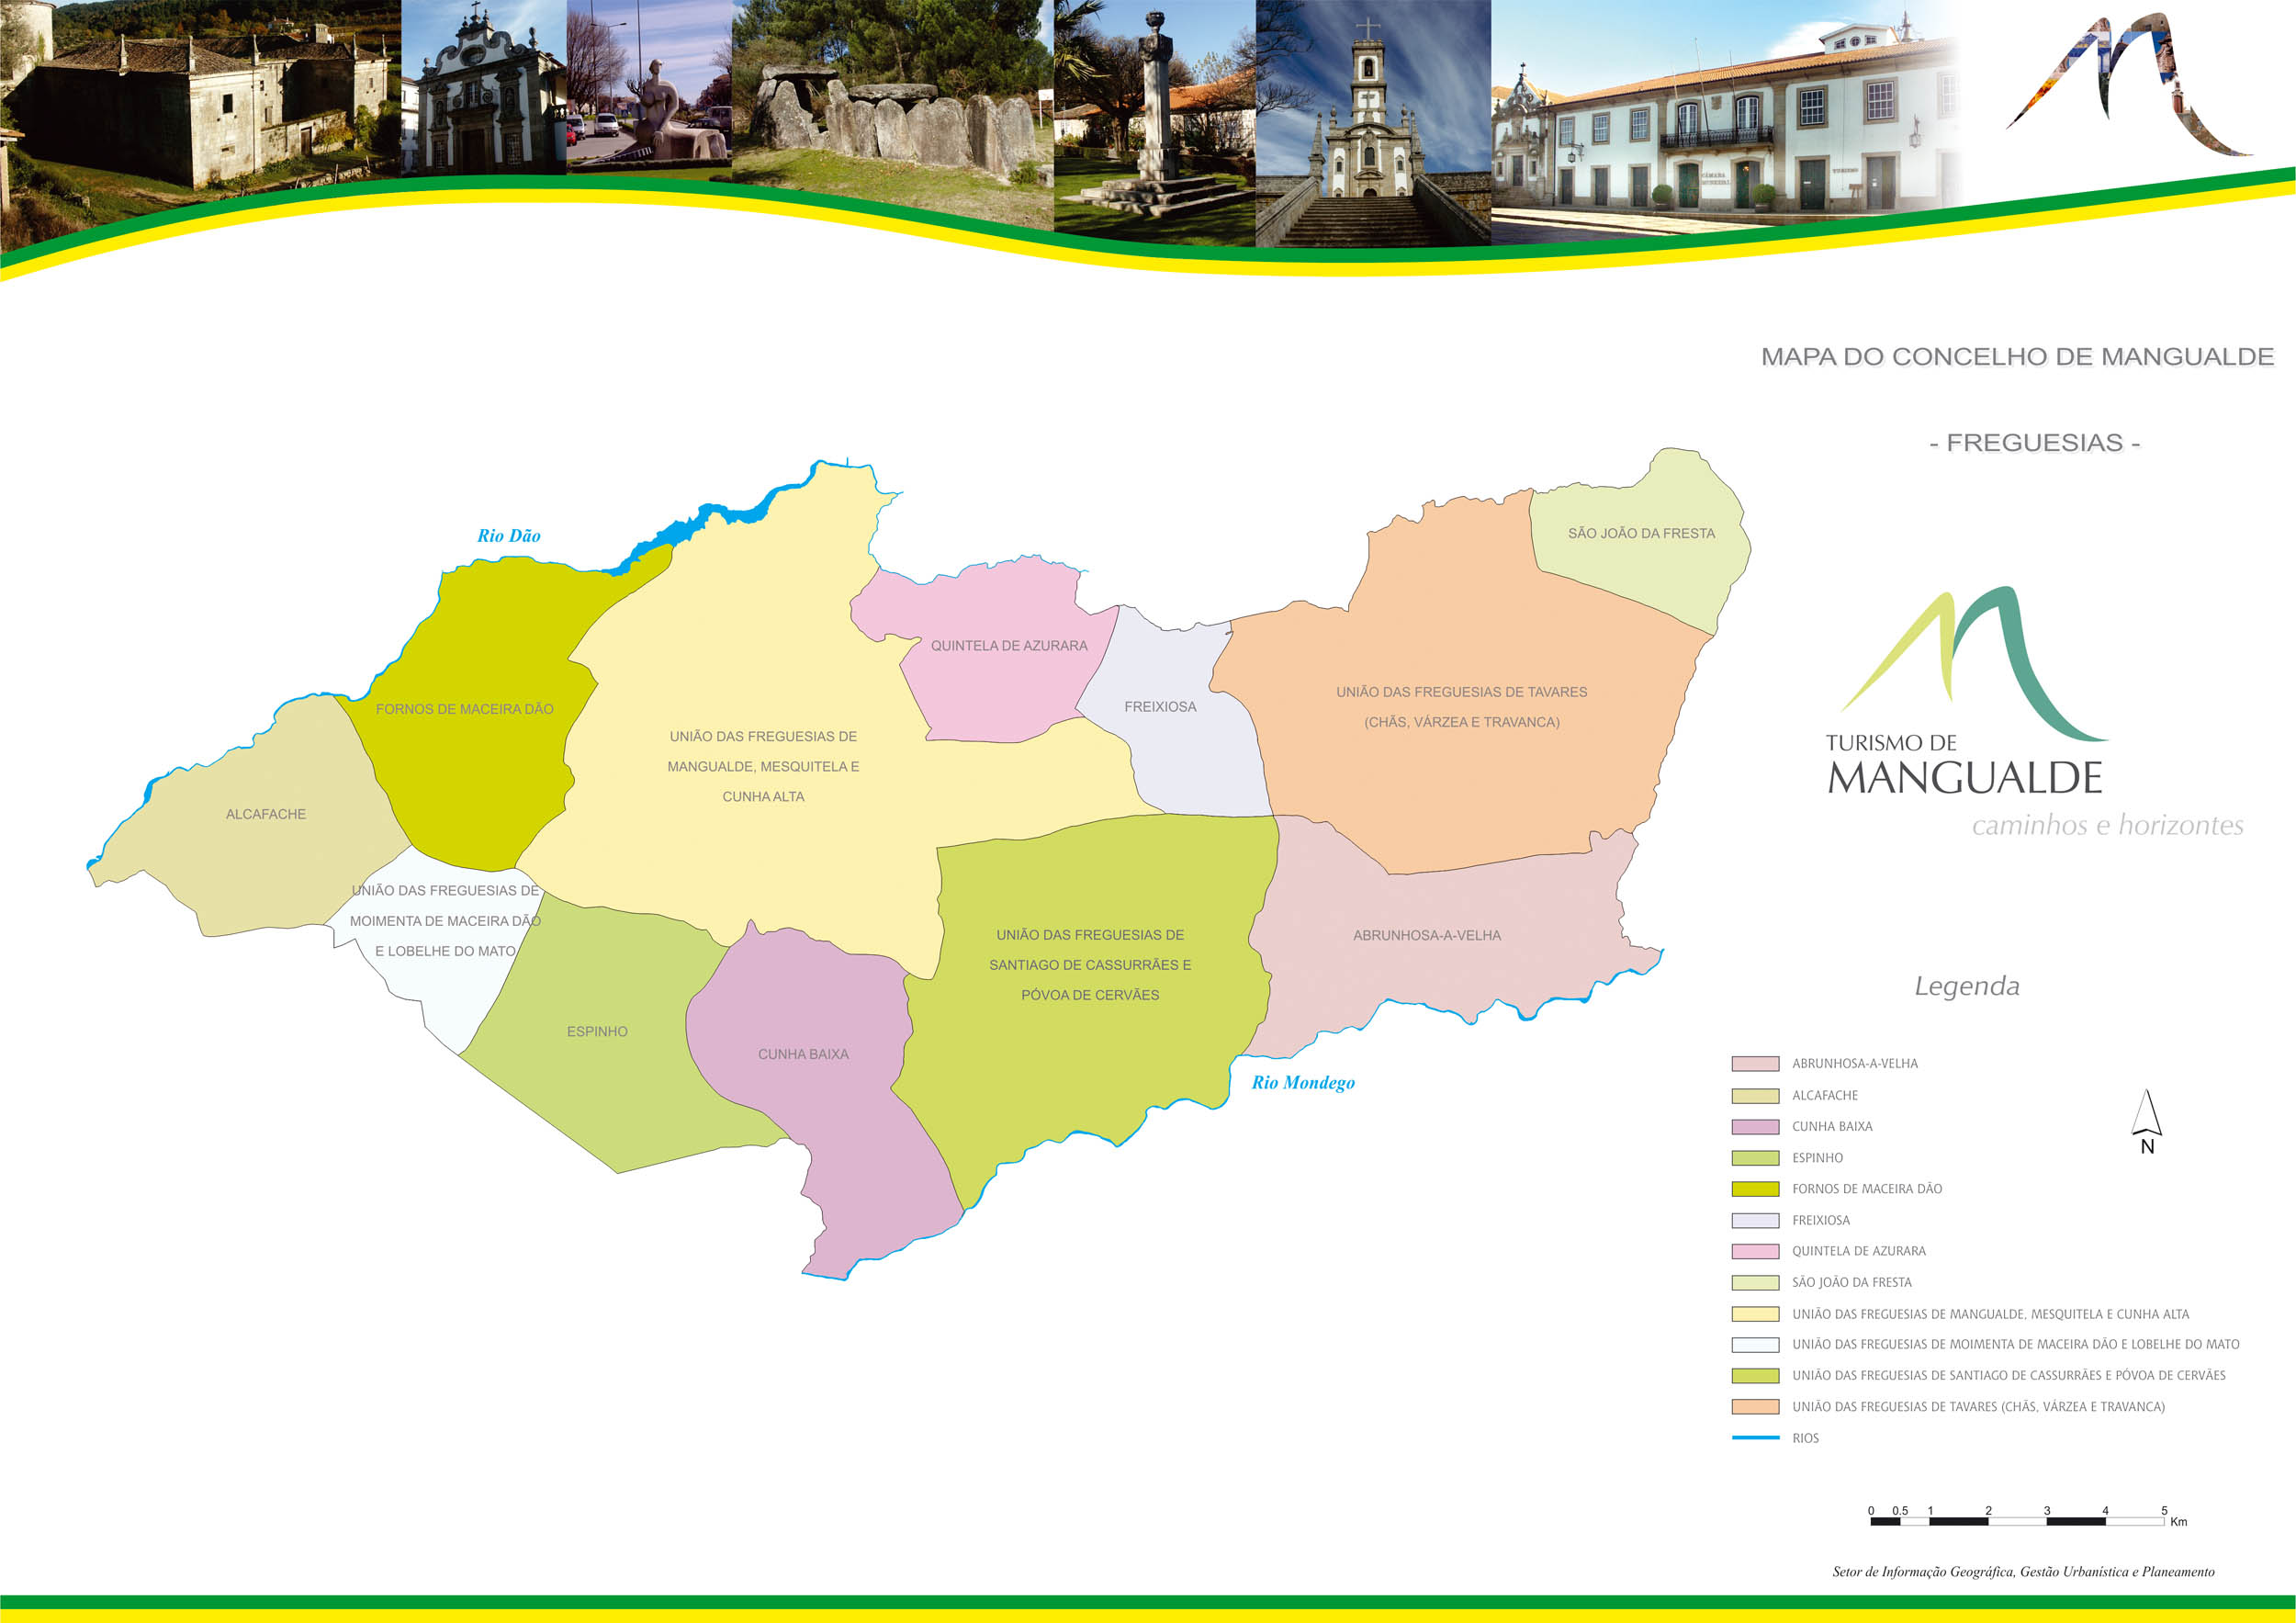 Mapas De Mangualde Camara Municipal De Mangualde